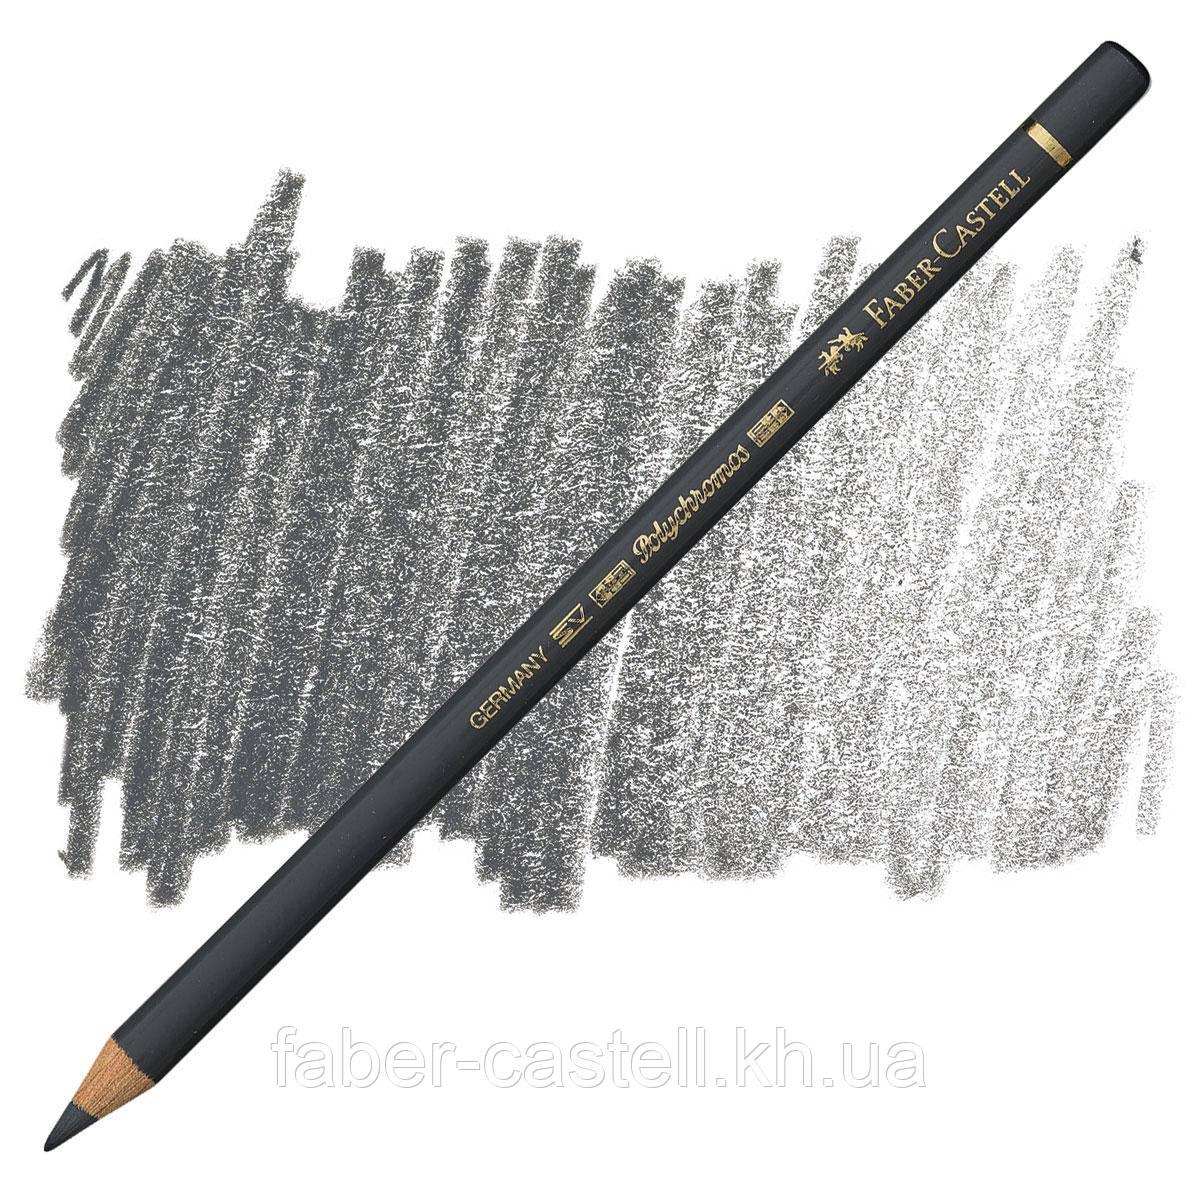 Карандаш цветной Faber-Castell POLYCHROMOS холодный серый Vl  №235 (Cold Gray Vl), 110235